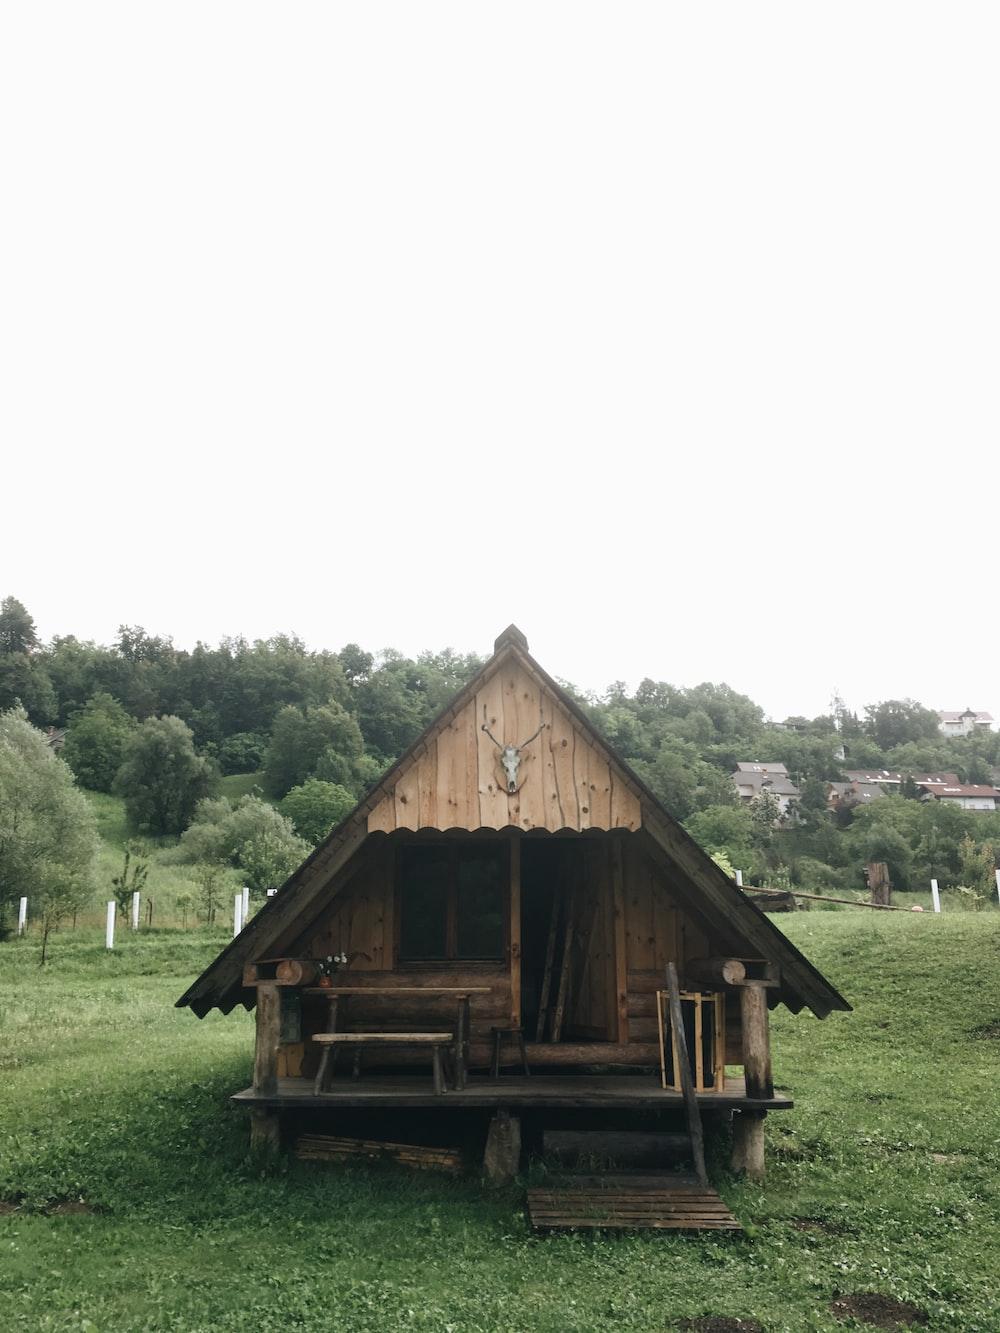 brown wooden house on green grassland during daytime